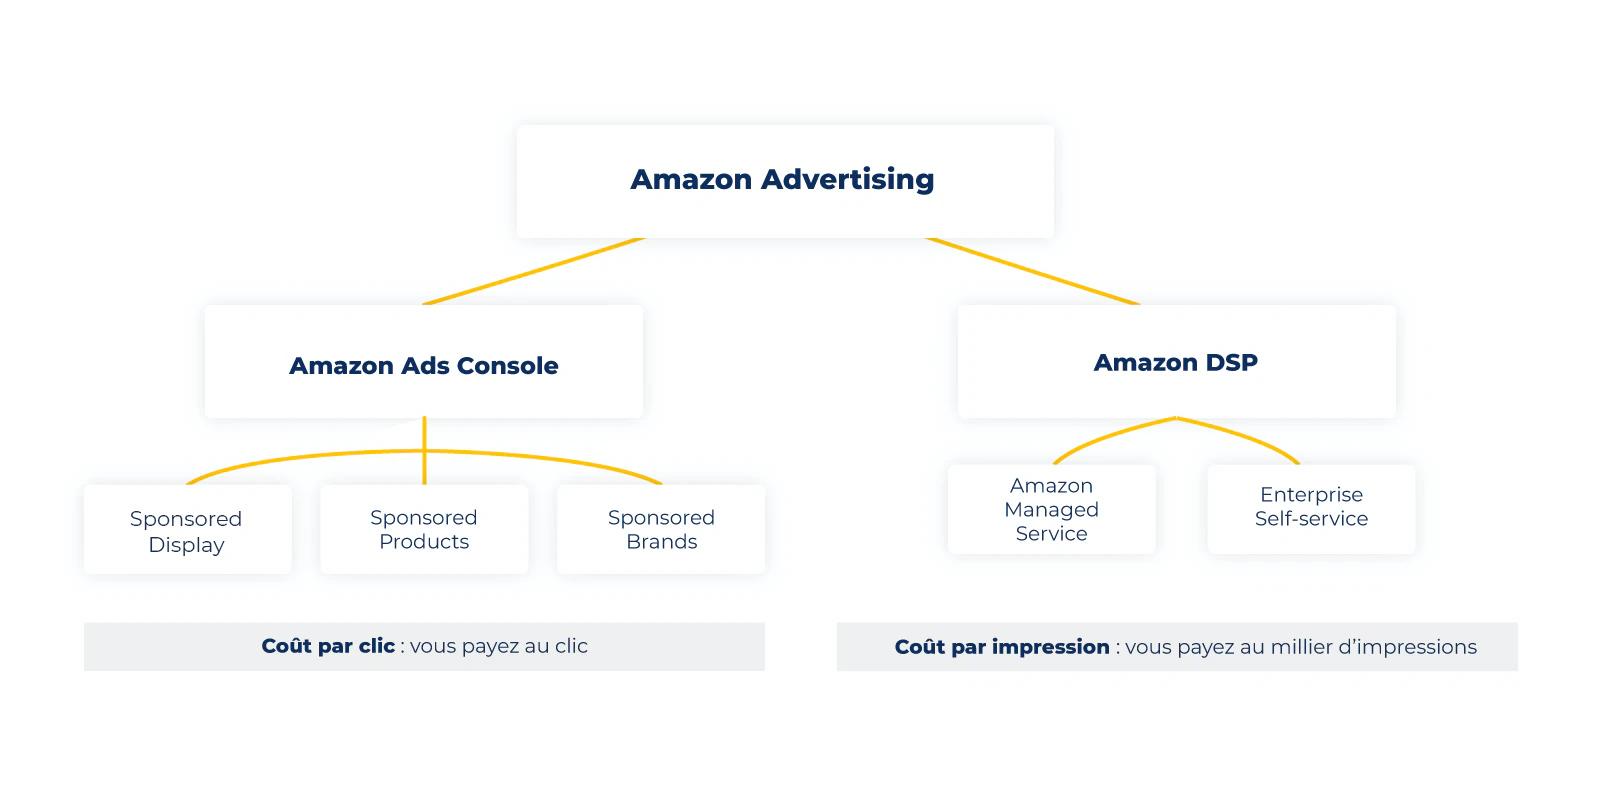 Graphique-Amazon-Advertising